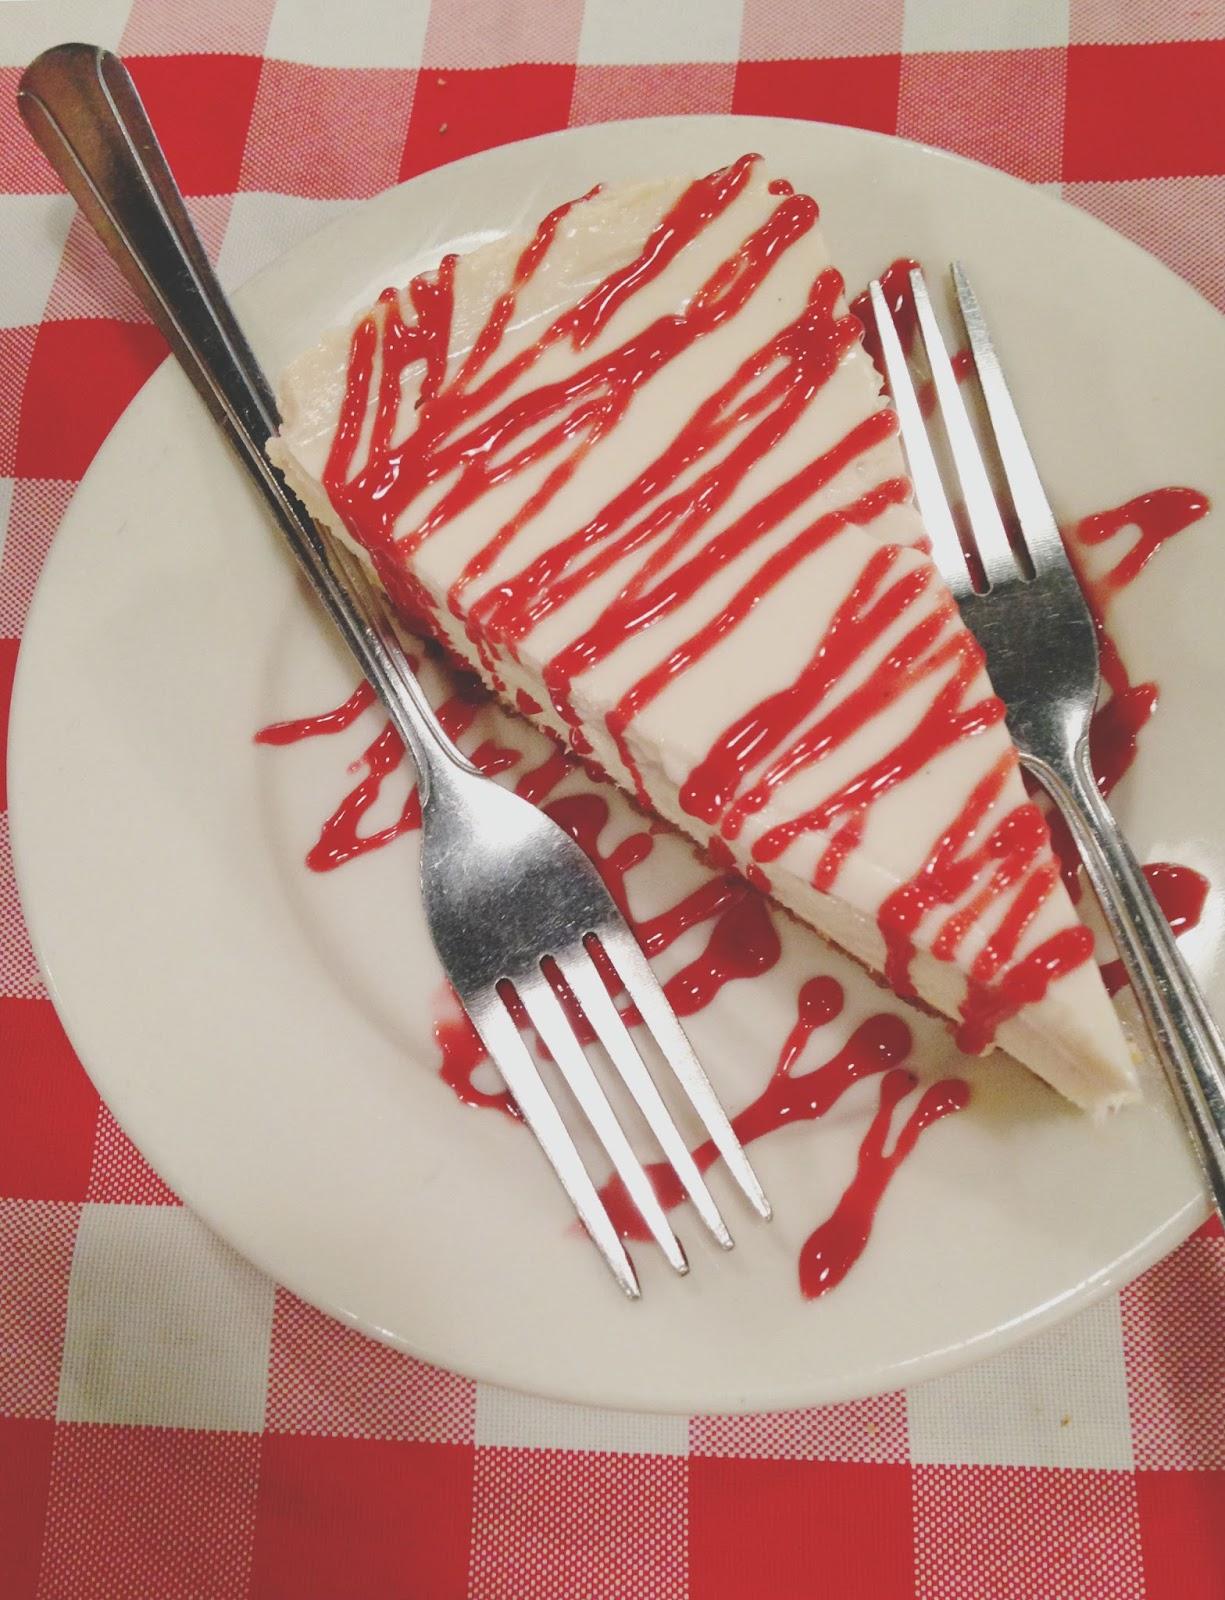 houston food cheesecake restaurants dinner byob collinas 07